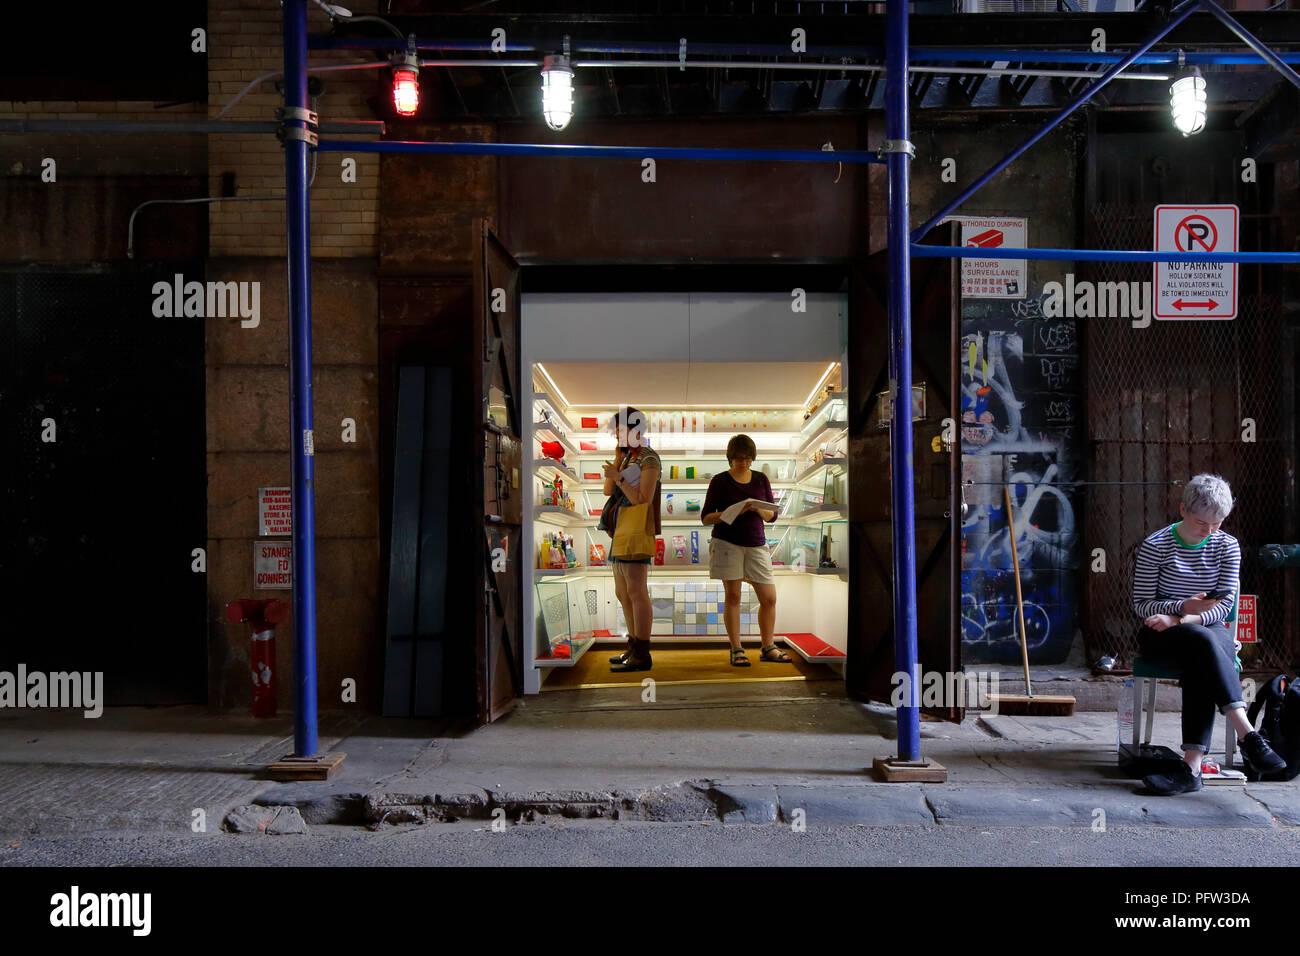 Mmuseumm, 4 Cortlandt Alley, New York, NY - Stock Image